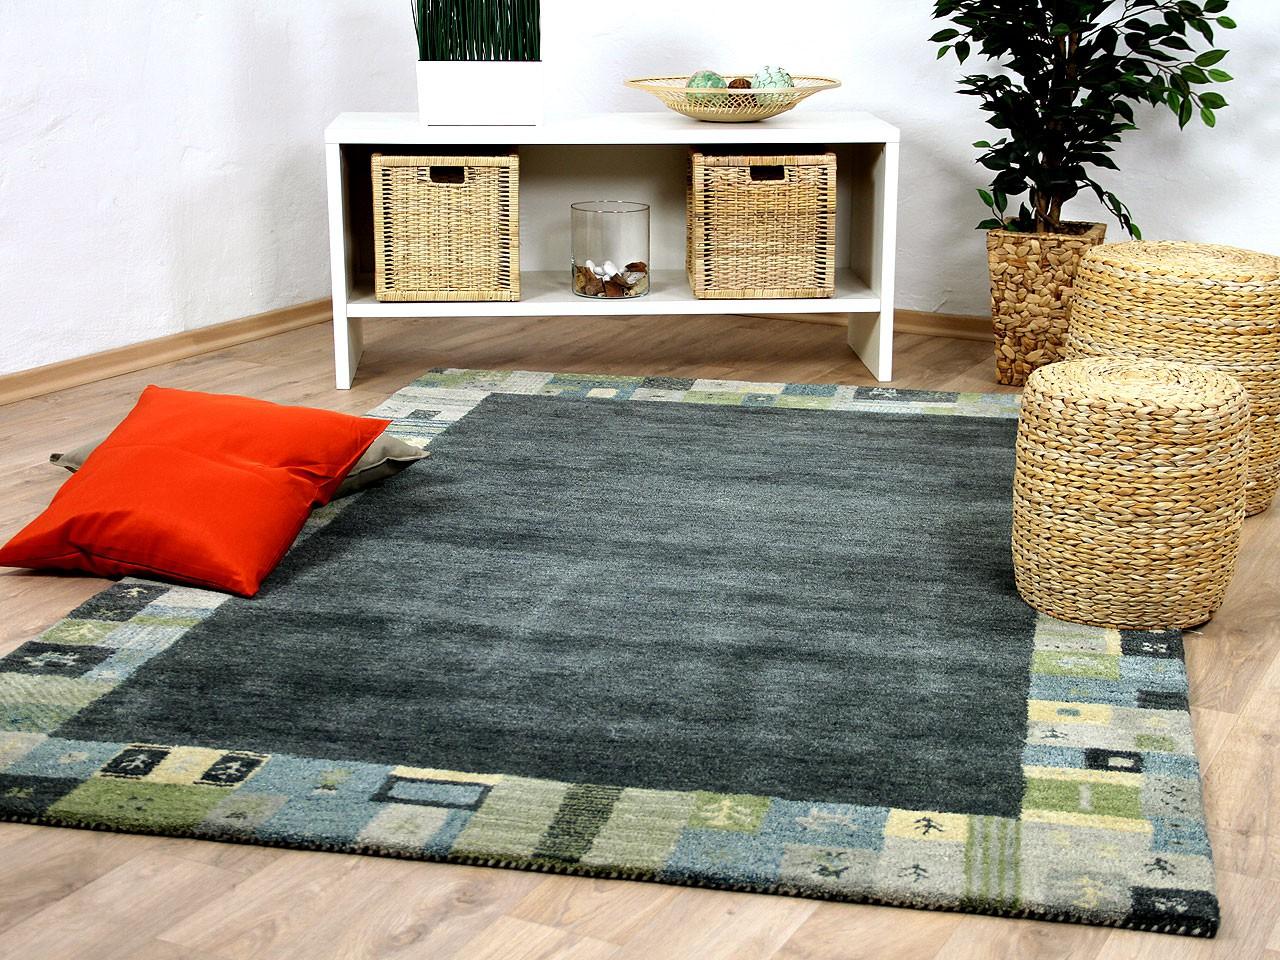 natur teppich indo gabbeh esta grau gr n bord re ebay. Black Bedroom Furniture Sets. Home Design Ideas